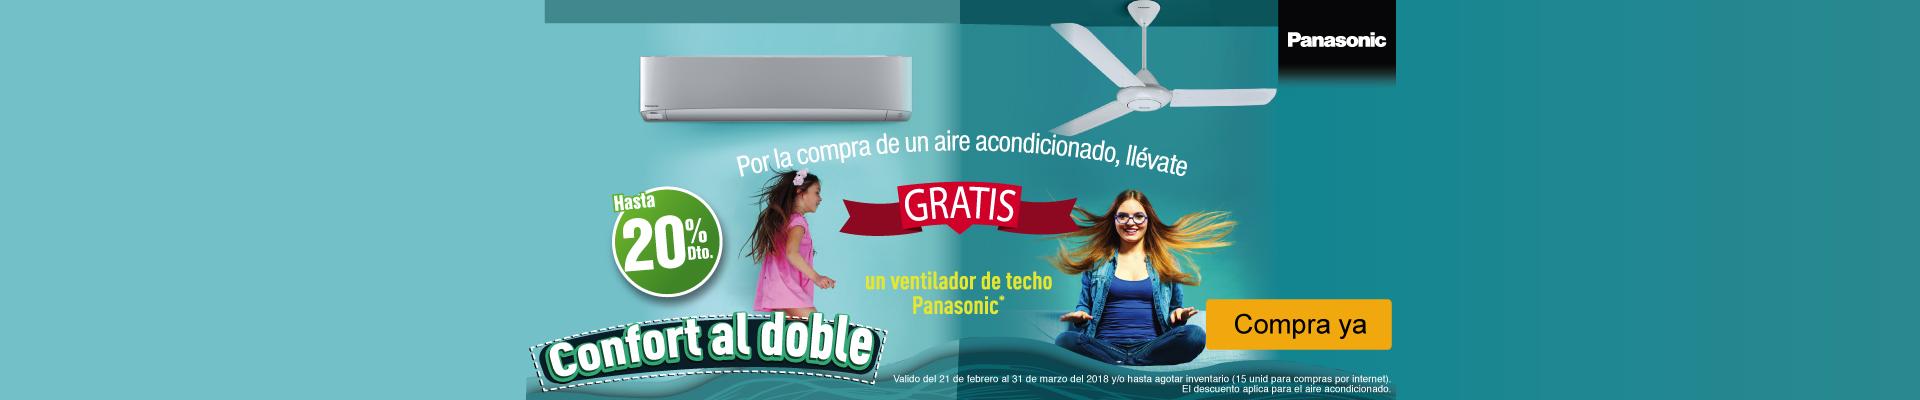 PPAL-AK-6-lb-Aires-Acondicionados-PANASONIC-gratis-ventilador-techo-cat-febrero21-23